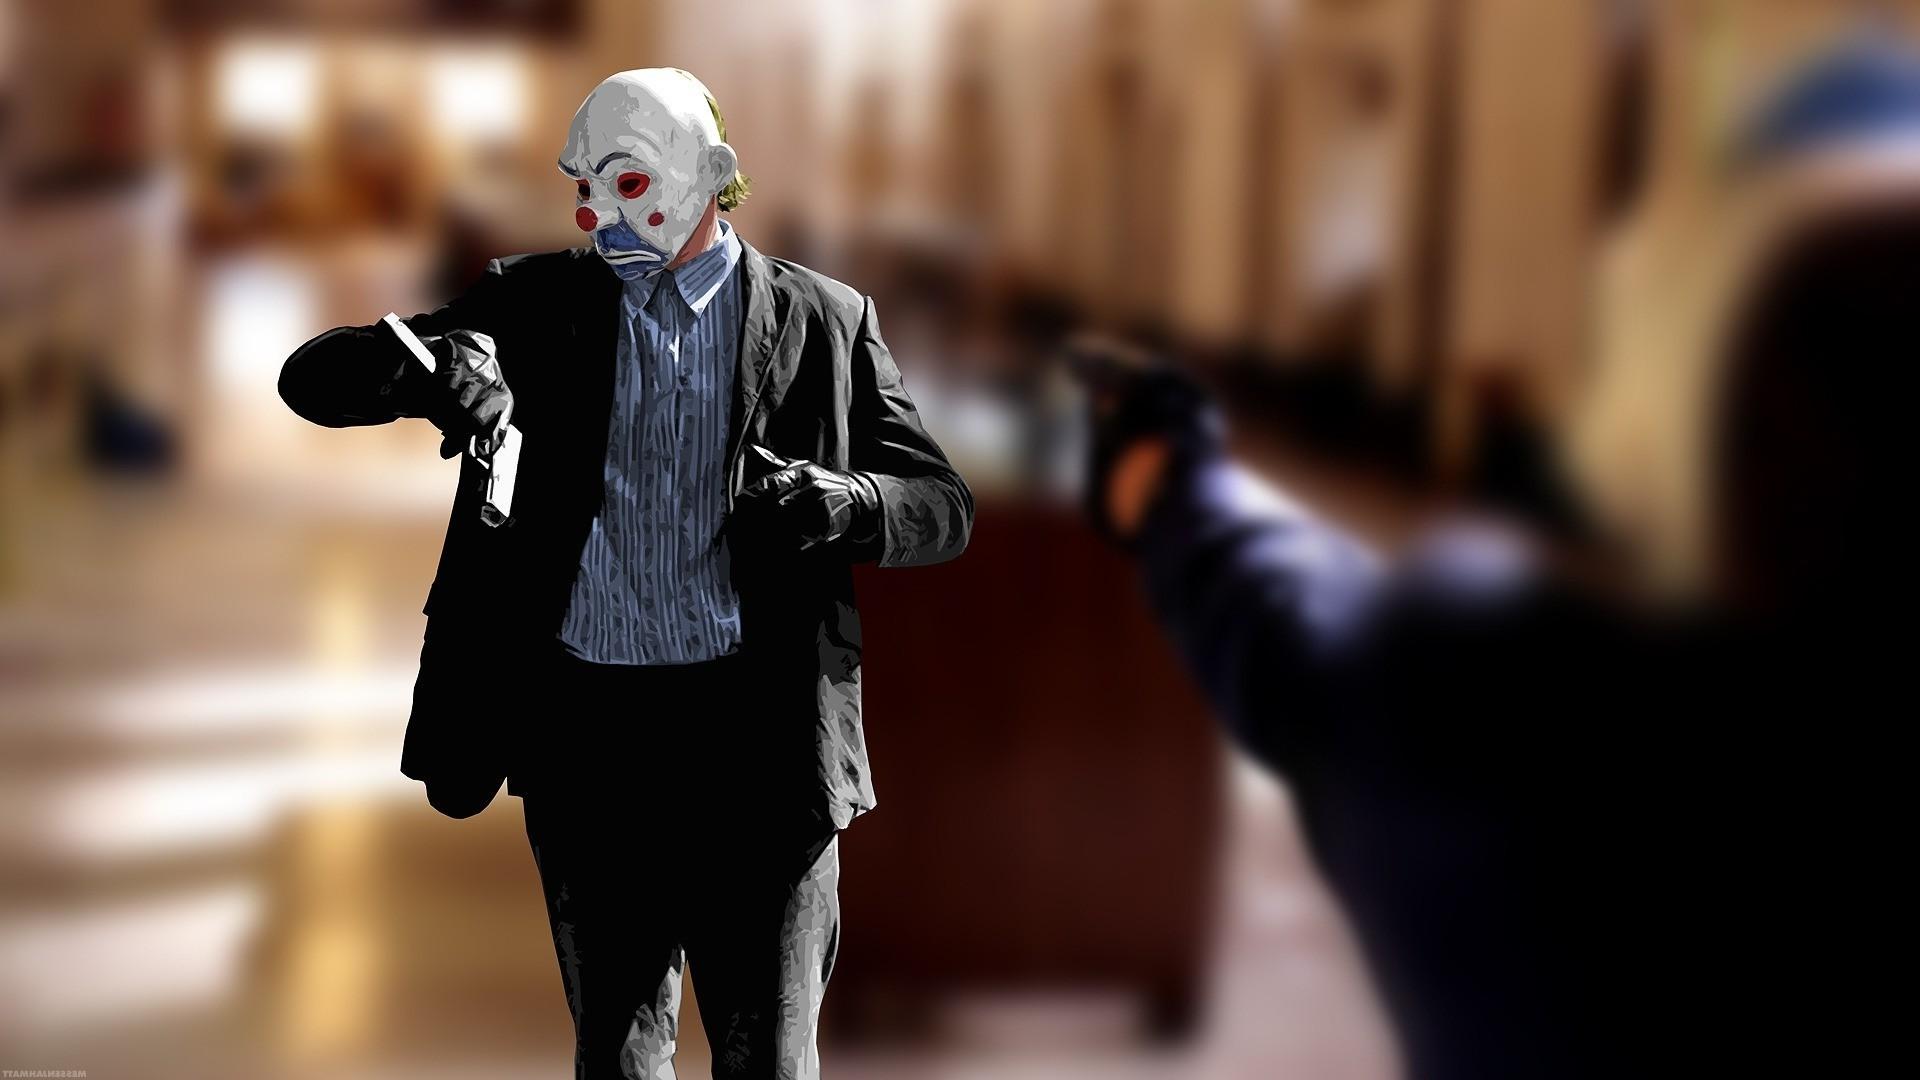 Batman, The Dark Knight, Clowns, MessenjahMatt Wallpapers HD / Desktop and  Mobile Backgrounds